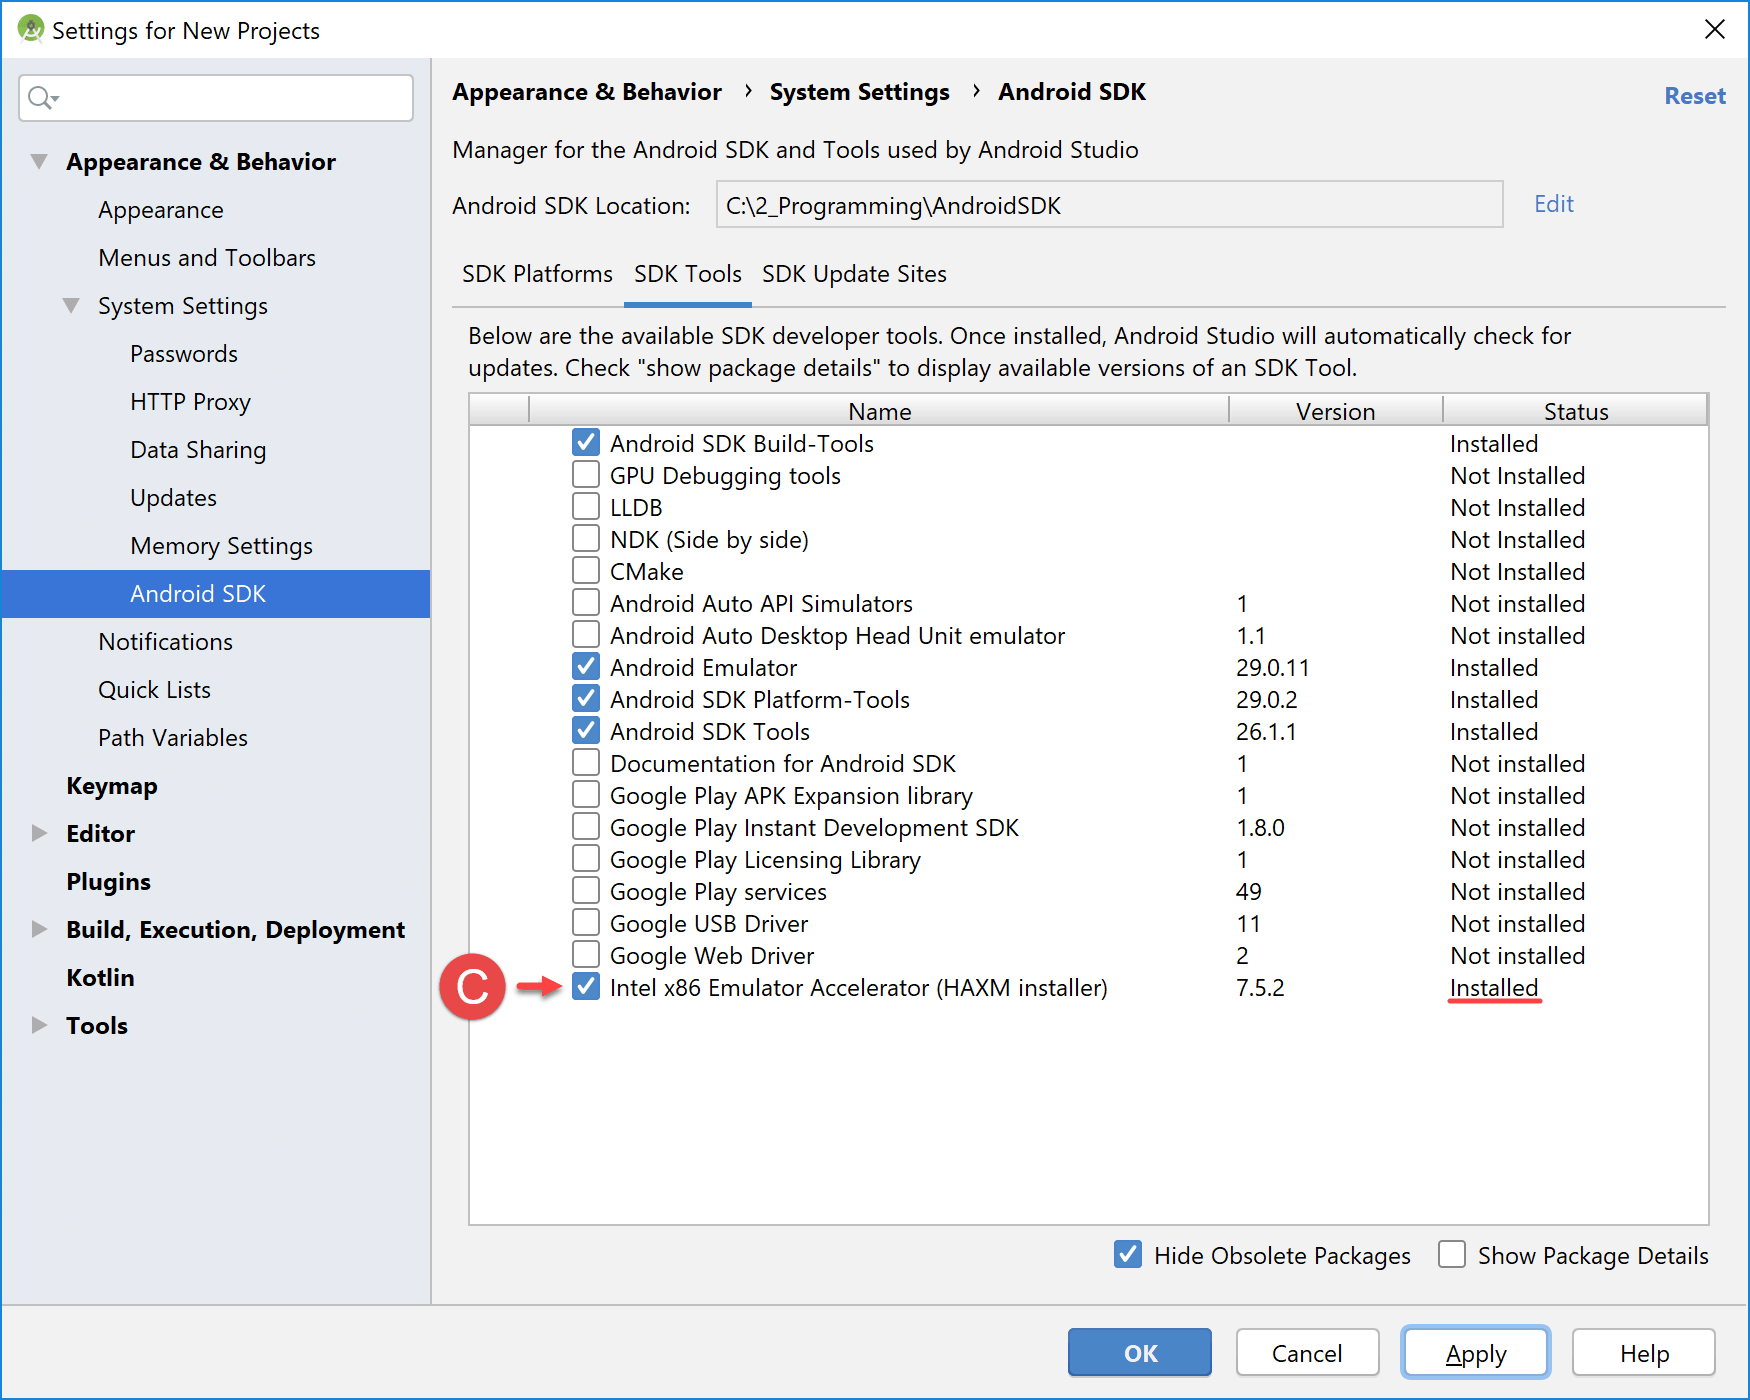 intel_haxm_installed